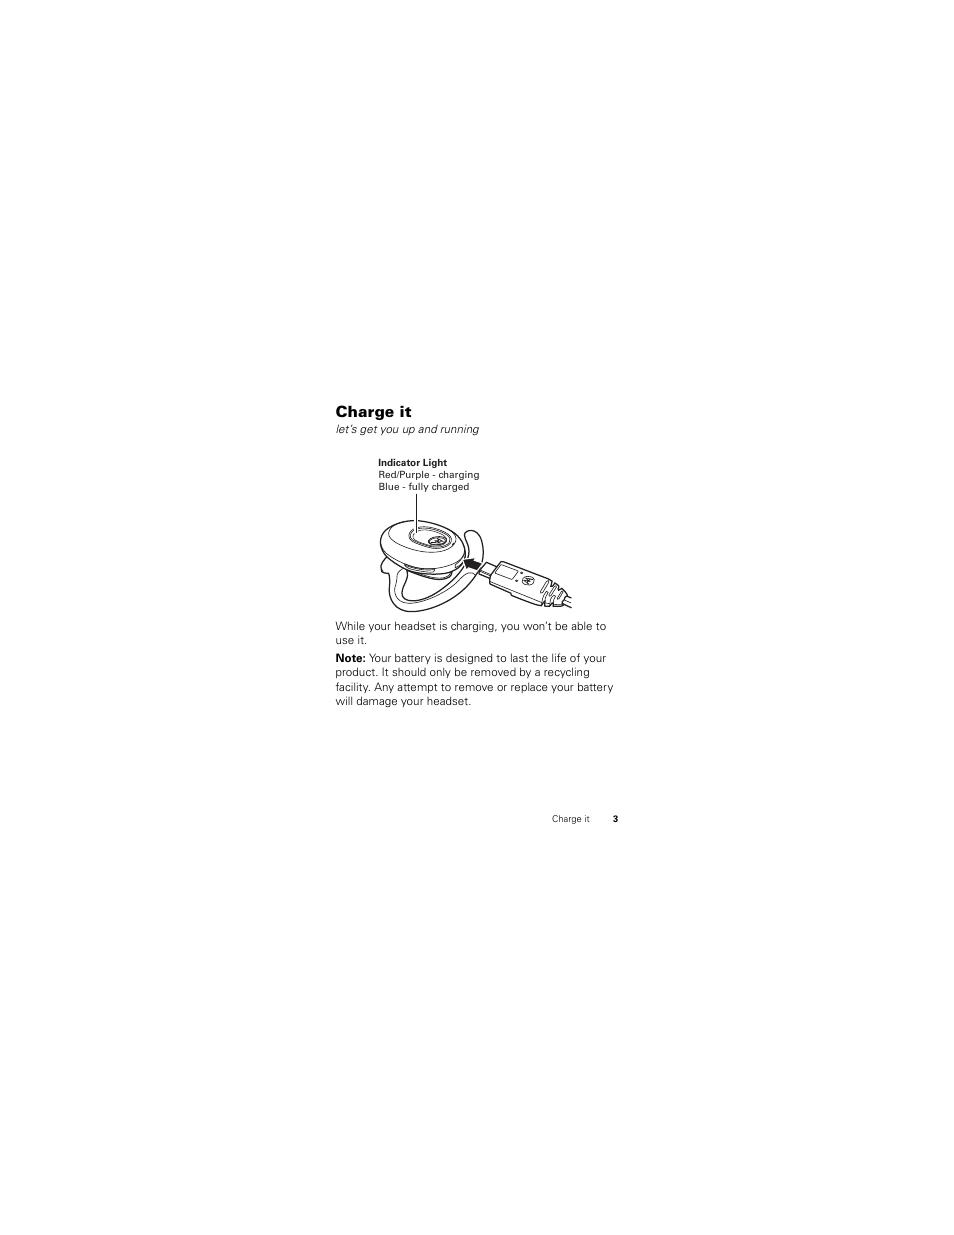 charge it motorola h730 user manual page 5 106 rh manualsdir com